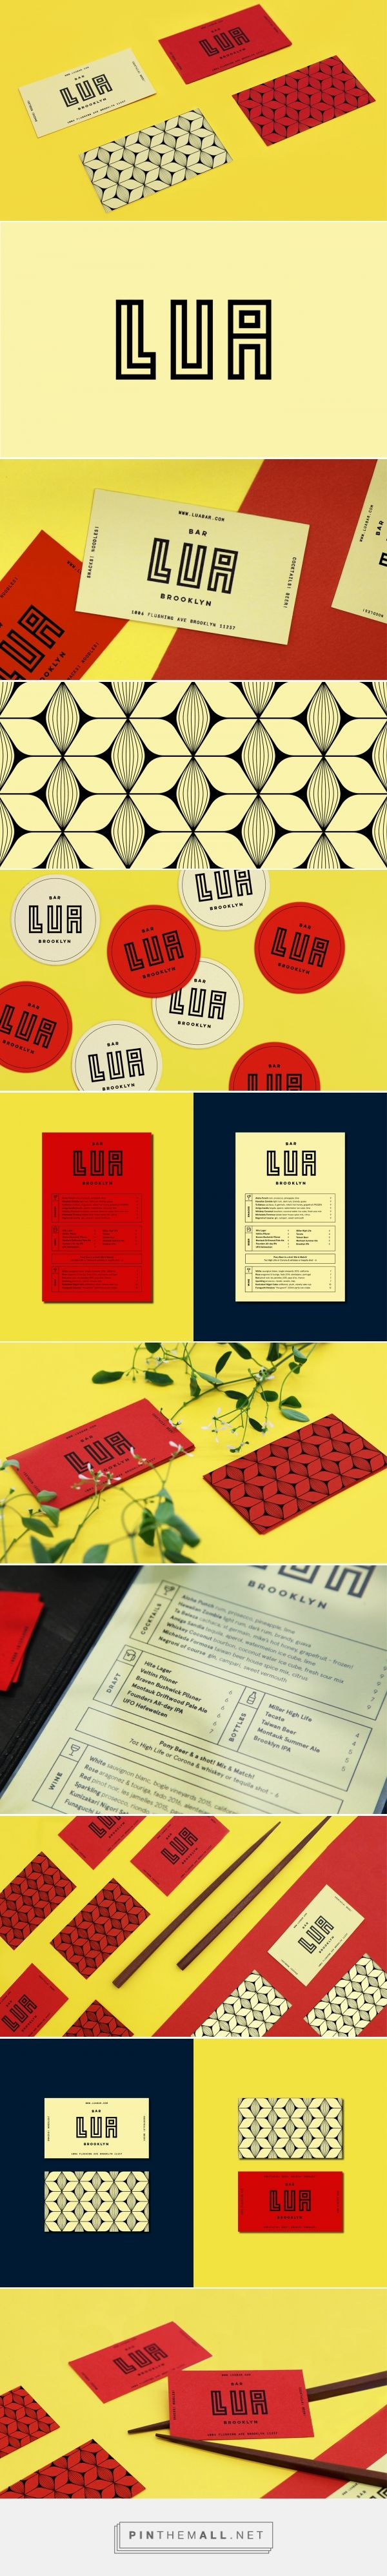 Lua Hawaiian-Japanese Bar Branding by Meredith Wallis | Fivestar Branding Agency – Design and Branding Agency & Curated Inspiration Gallery